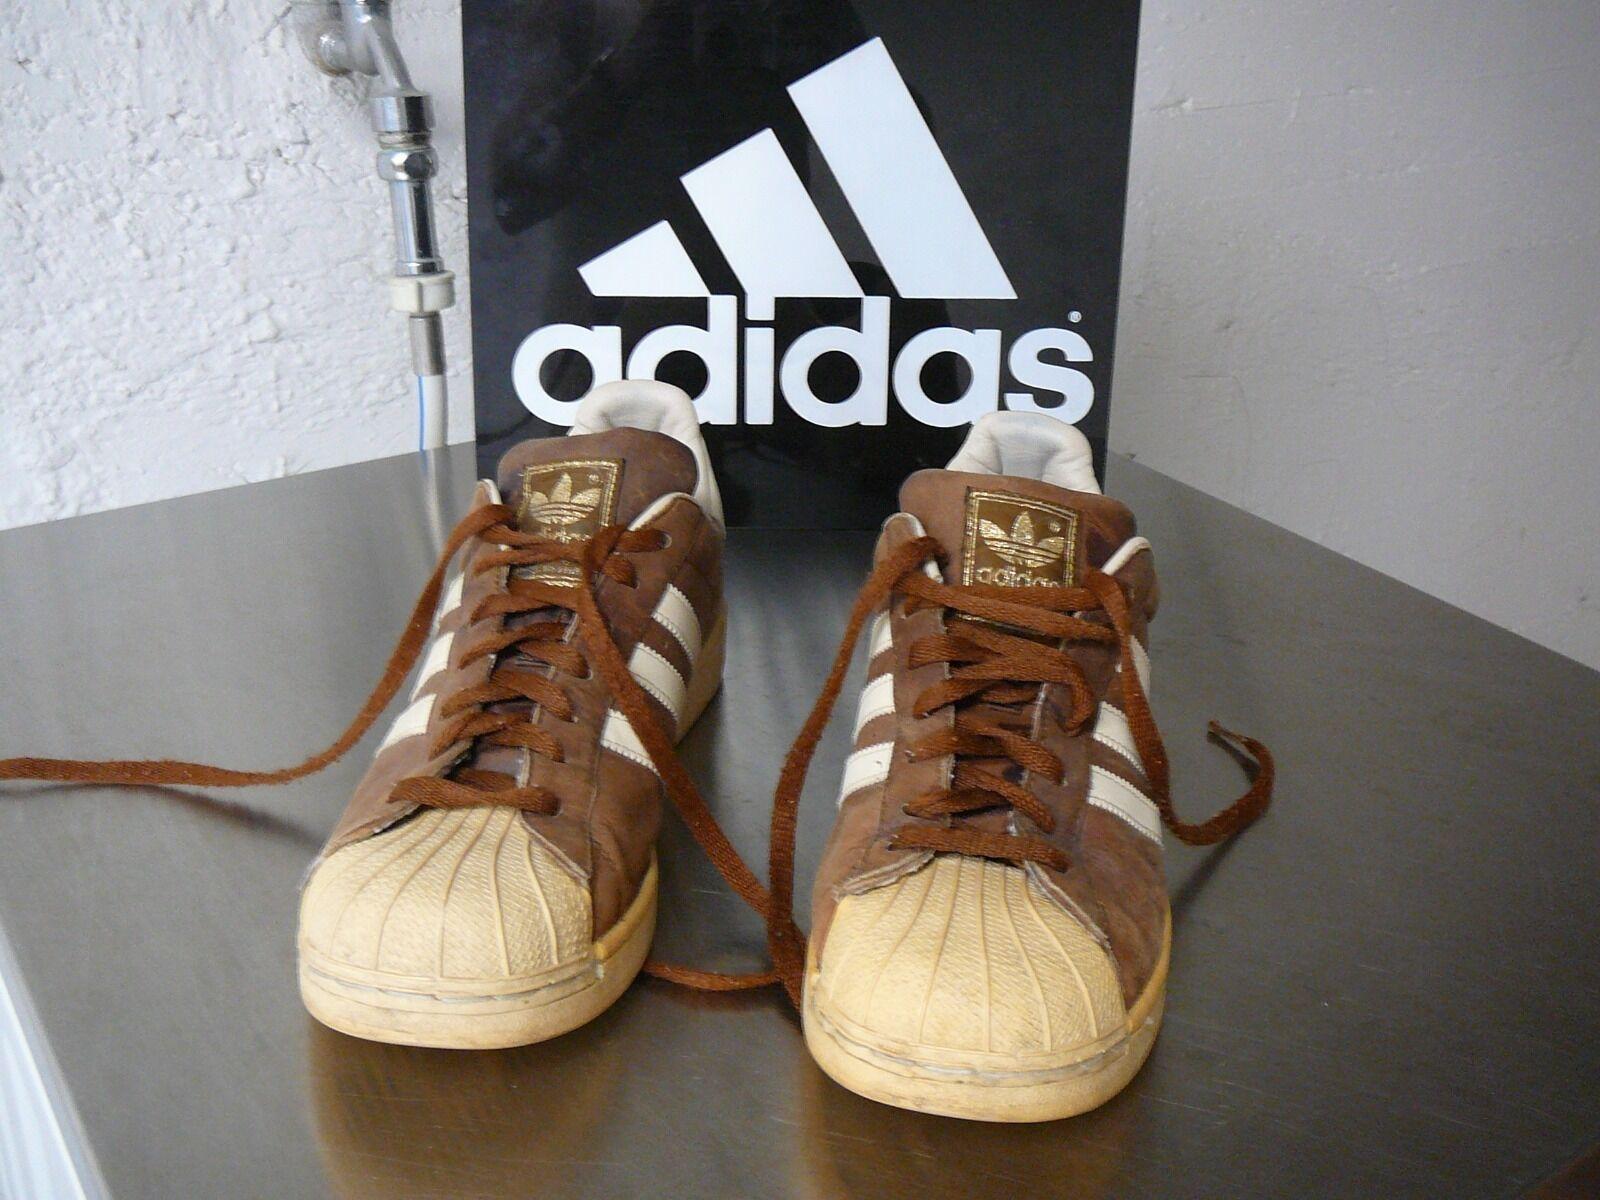 Adidas Vintage Superstar II Waxed  UK 10.5  Very RAR Heißer verkauf